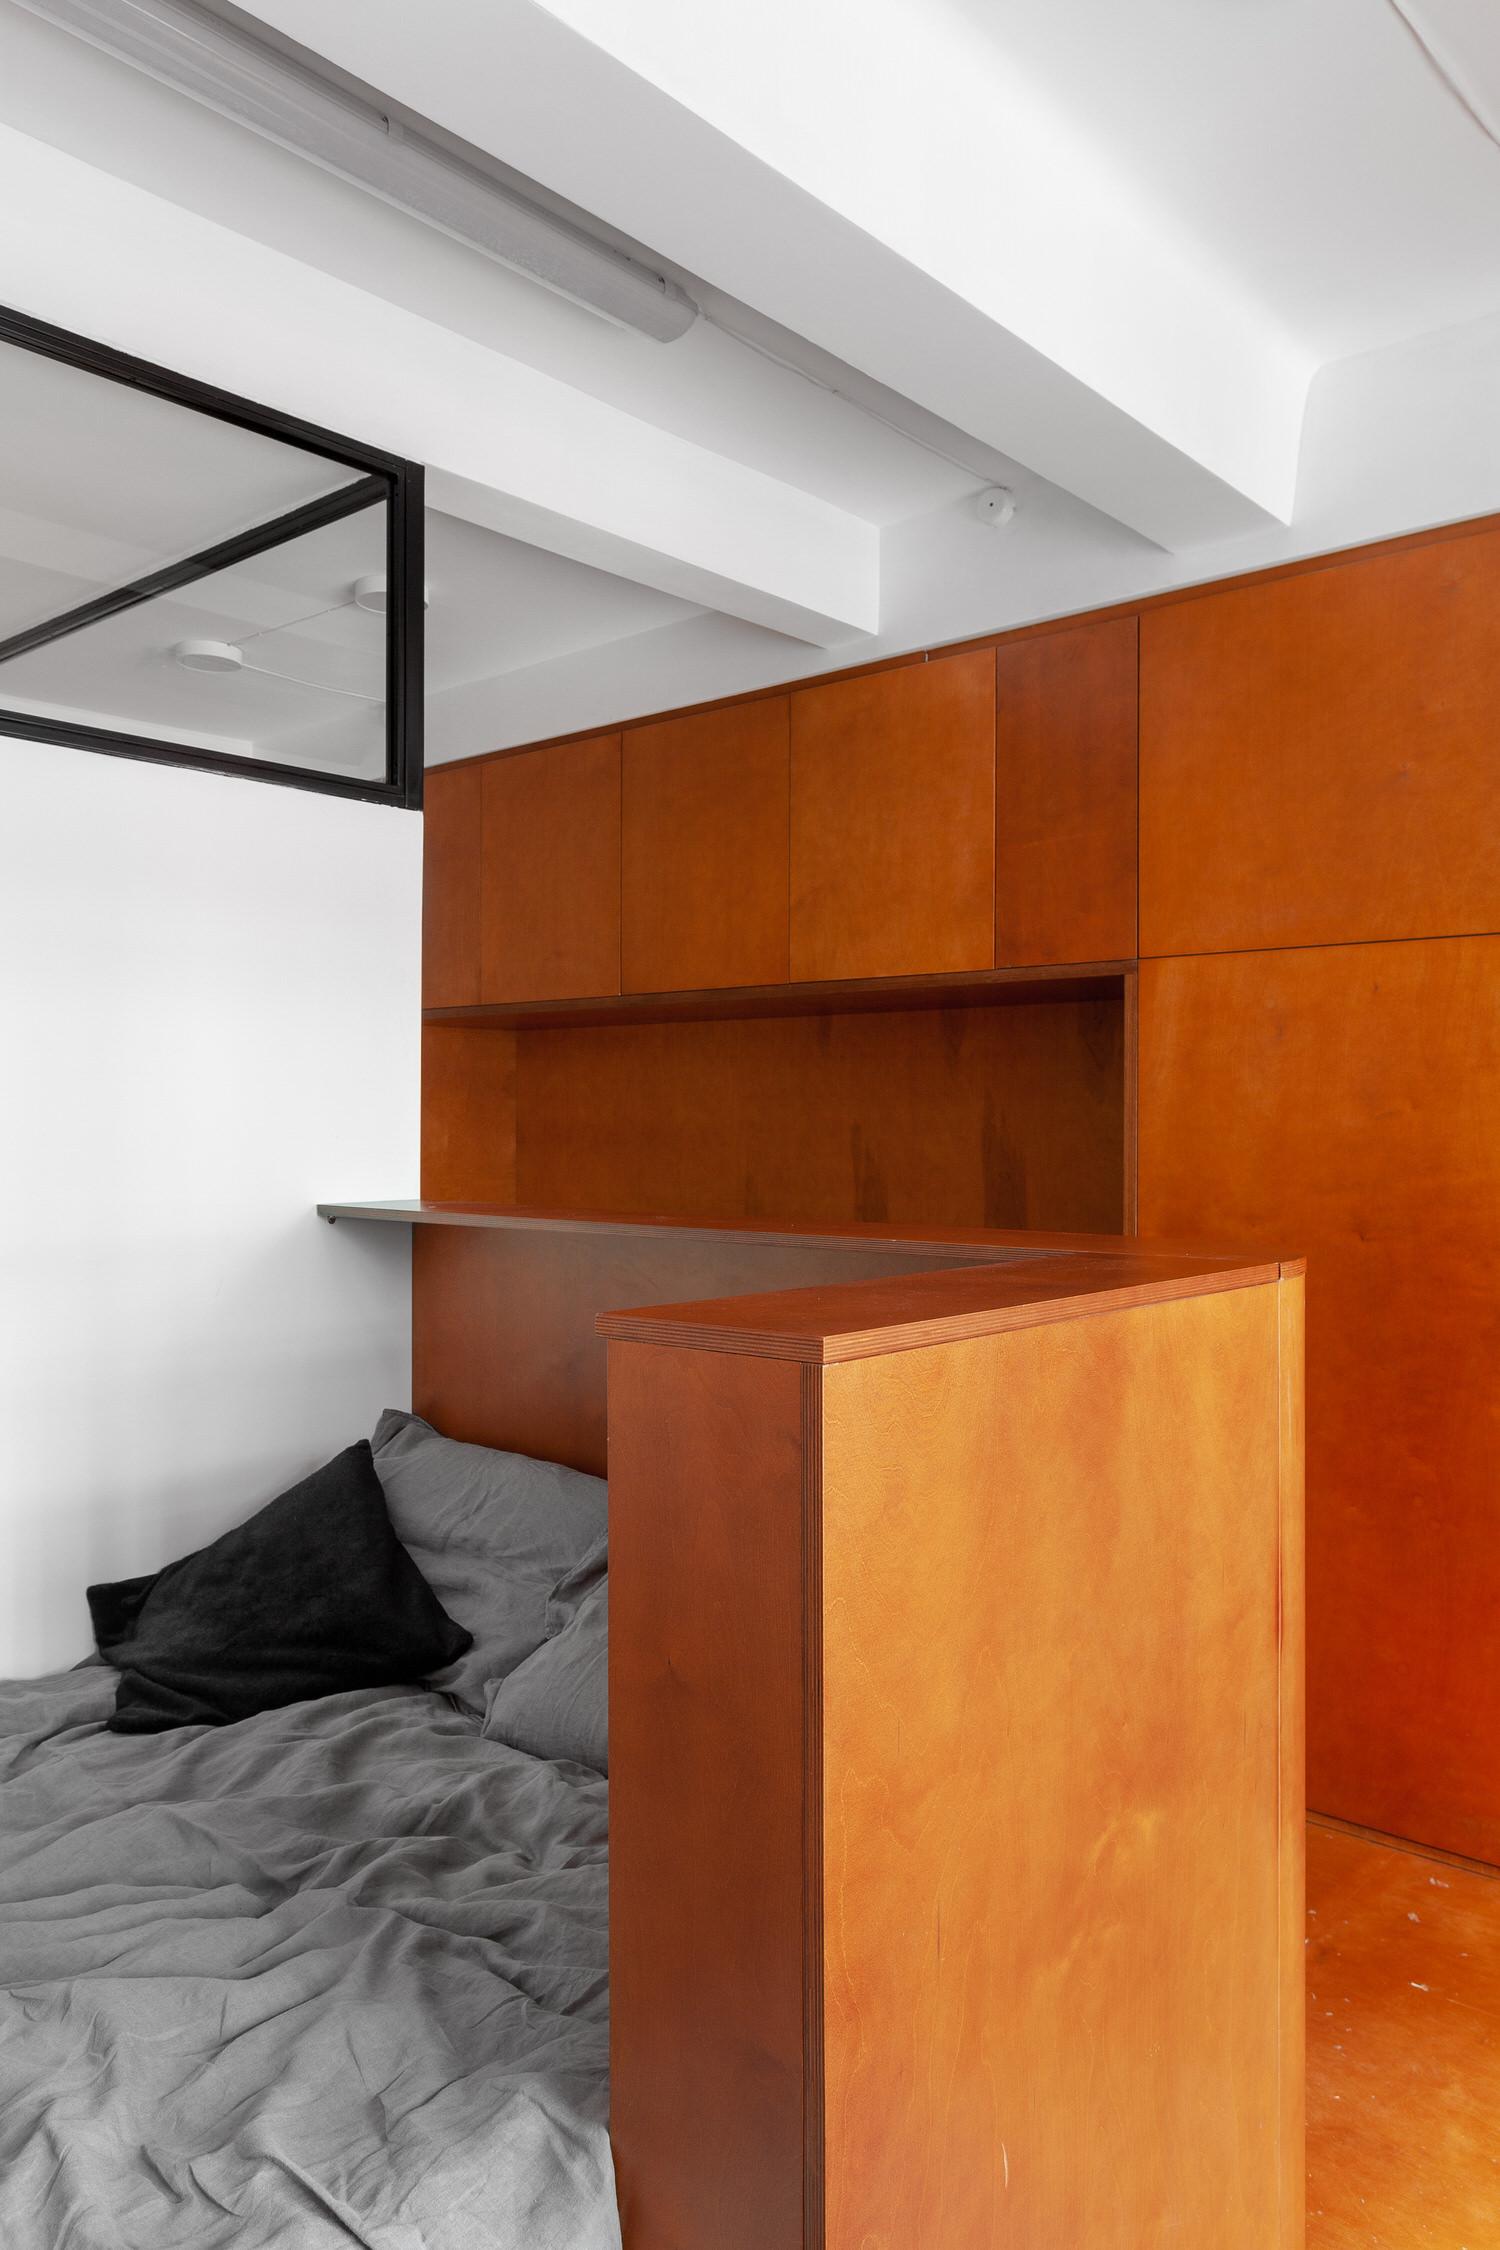 Room Design Buro Commune 303 Tiny Moscow Apartment Interior Photo Polina Poludkina Yellowtrace 20